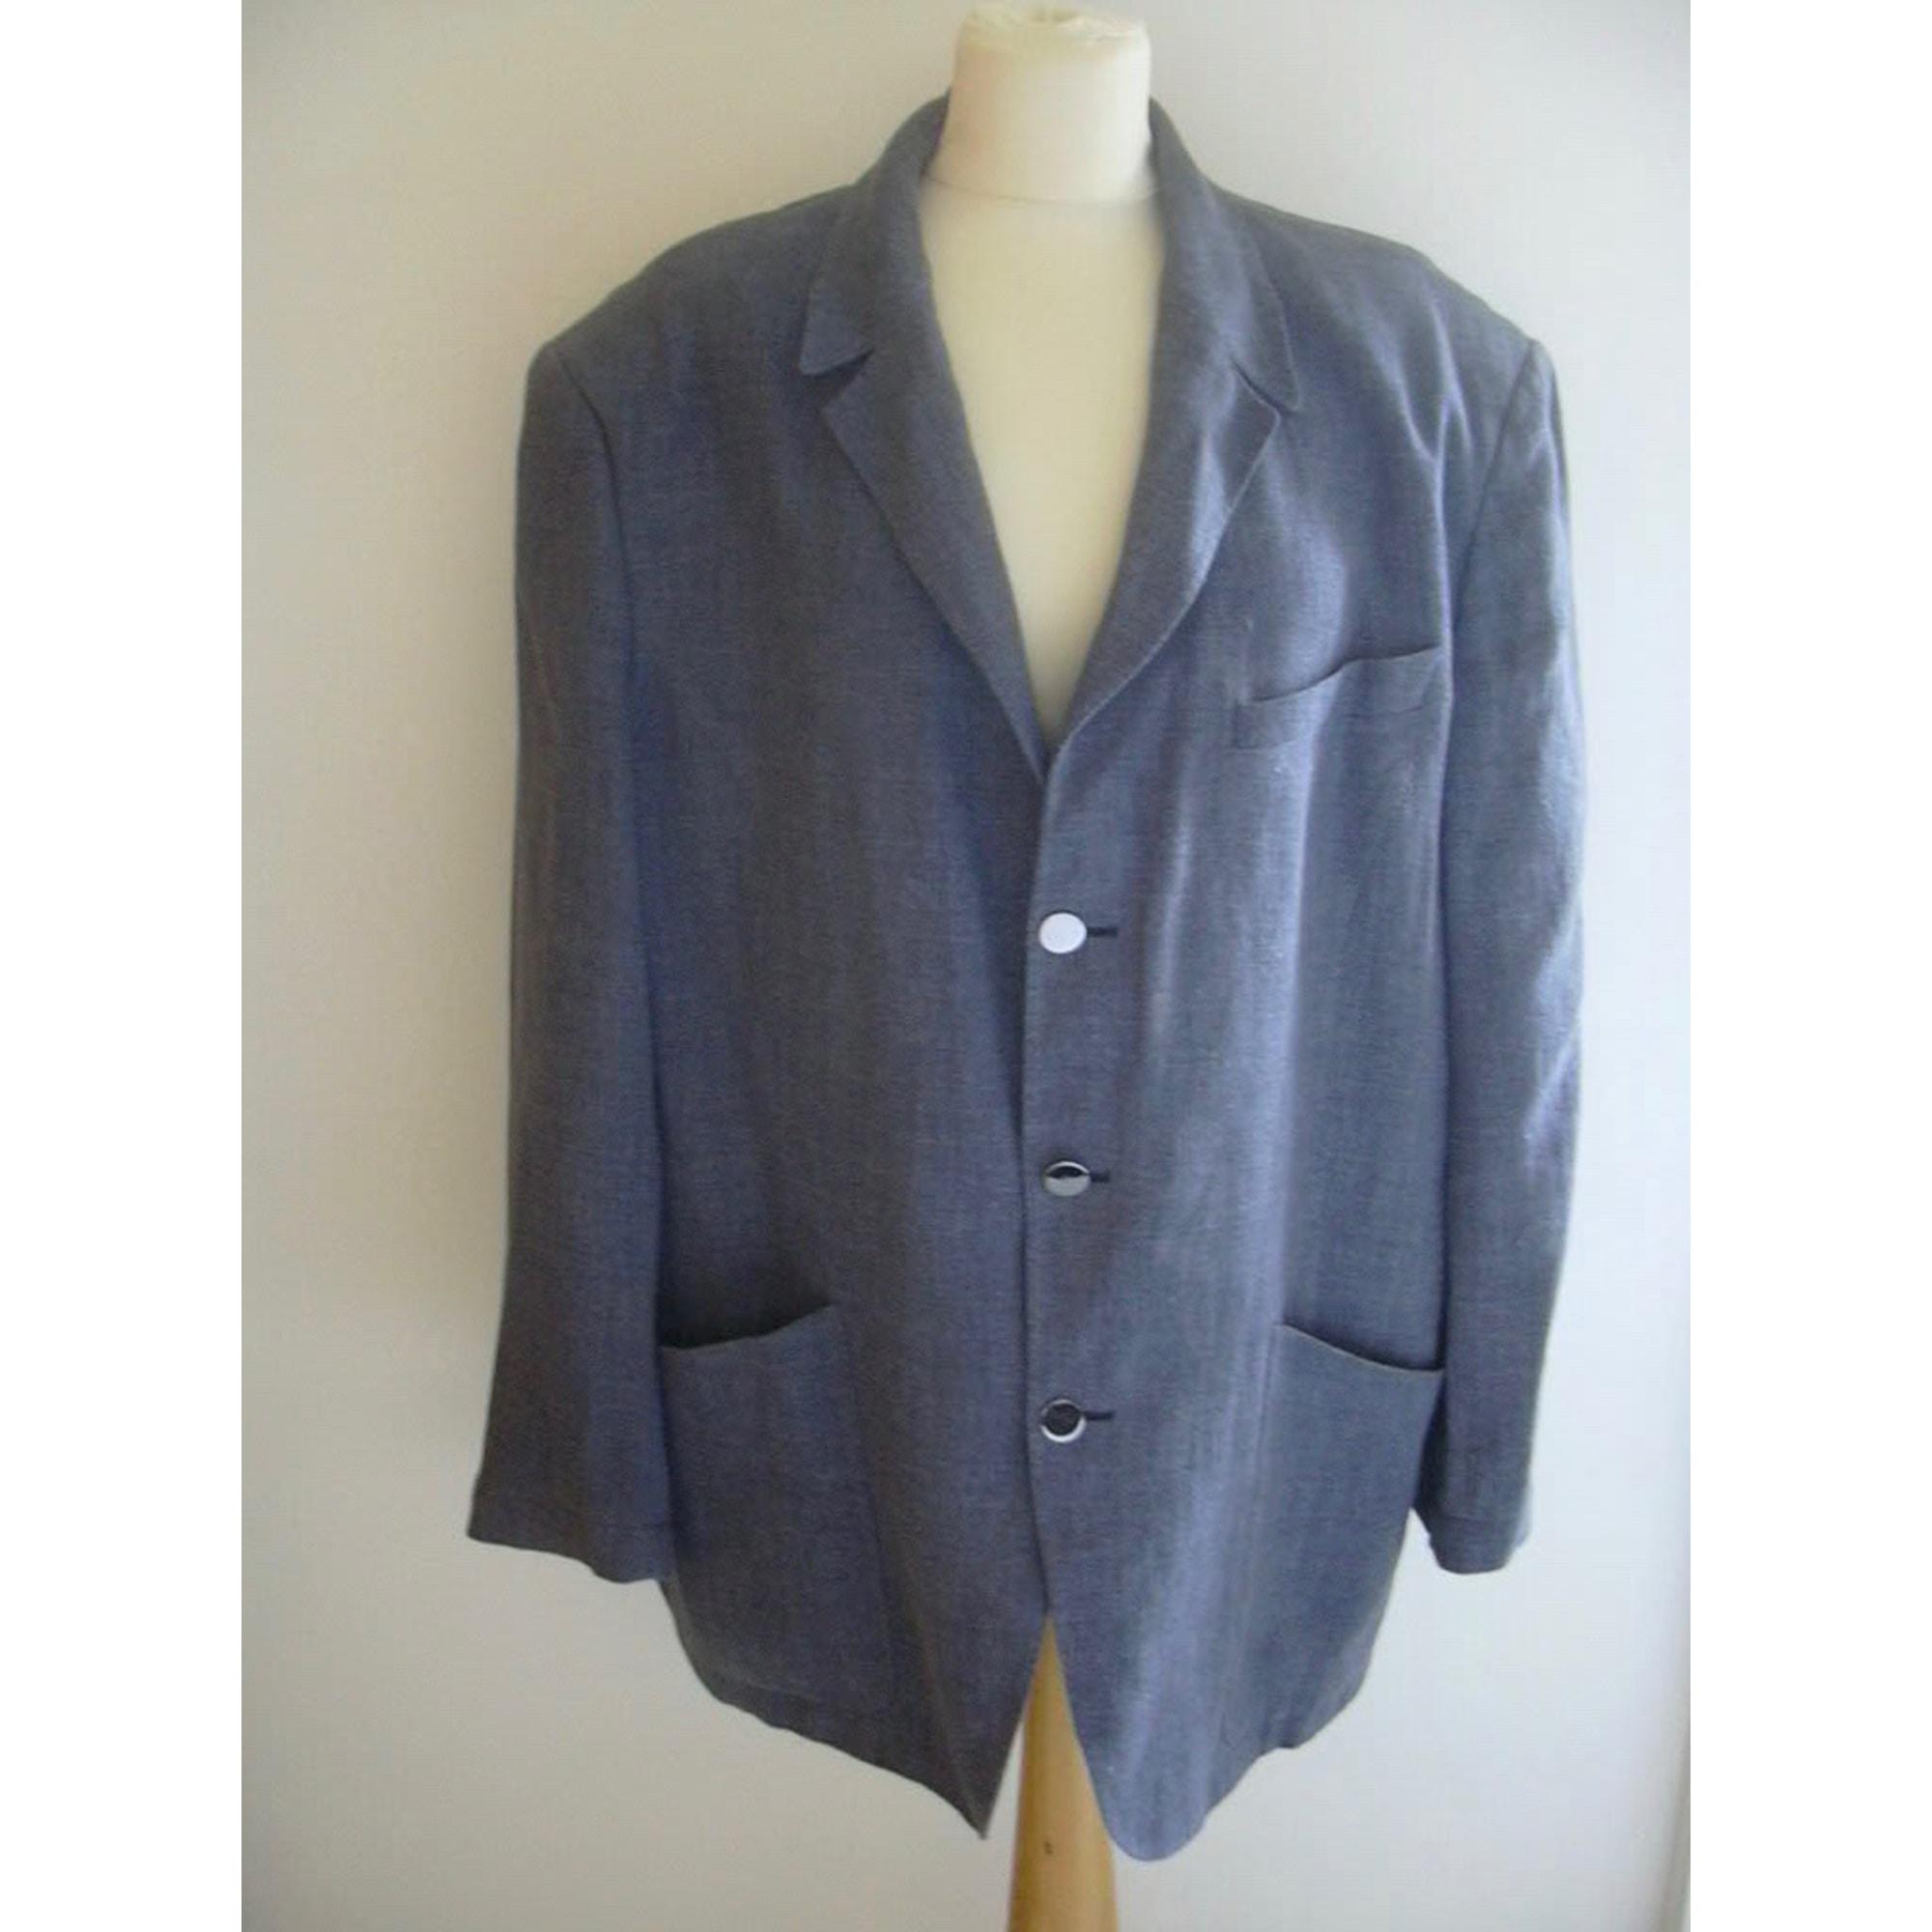 Veste de costume THIERRY MUGLER Bleu, bleu marine, bleu turquoise